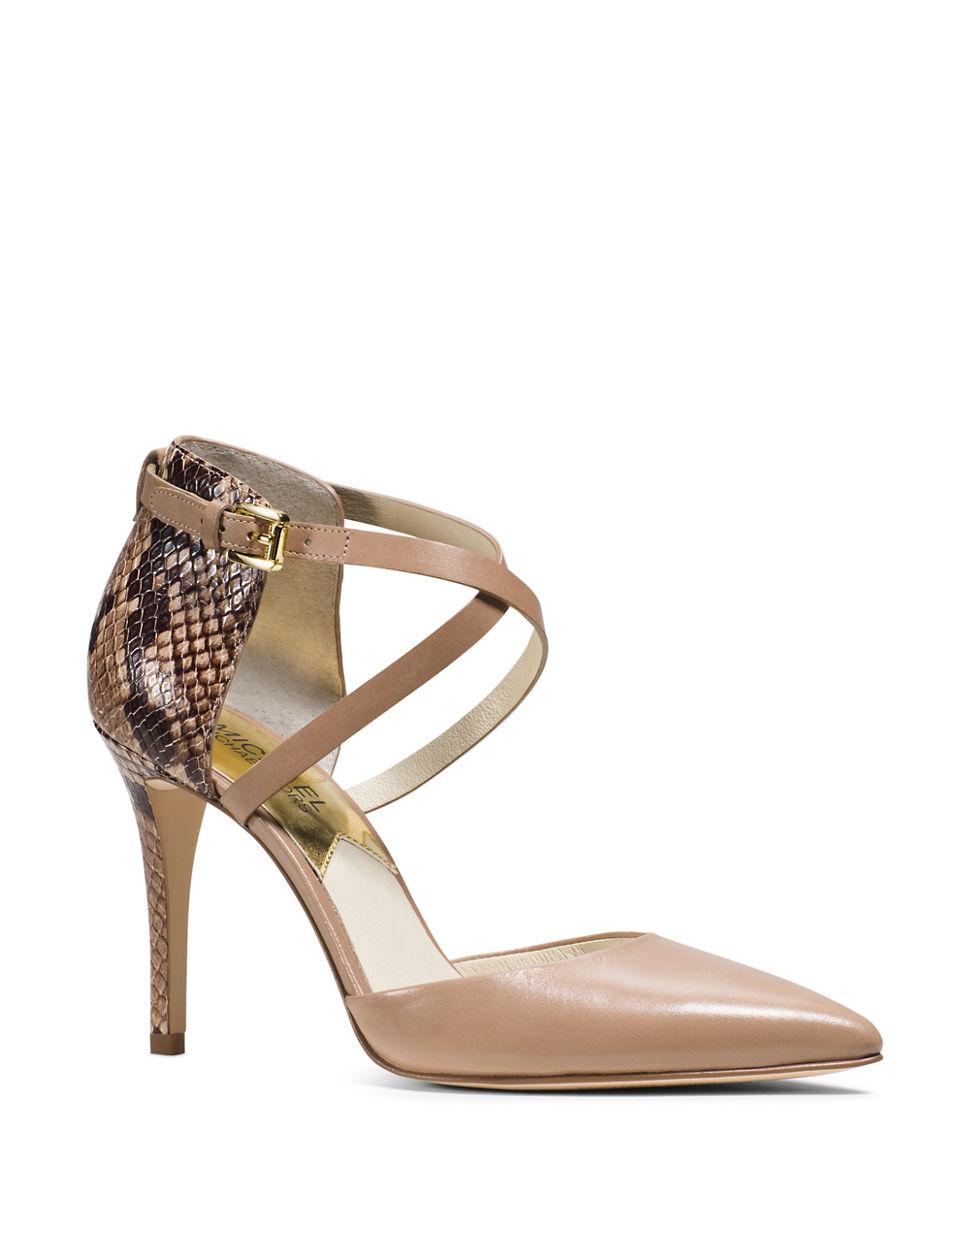 michael kors beige snakeskin embossed leather purse info cel